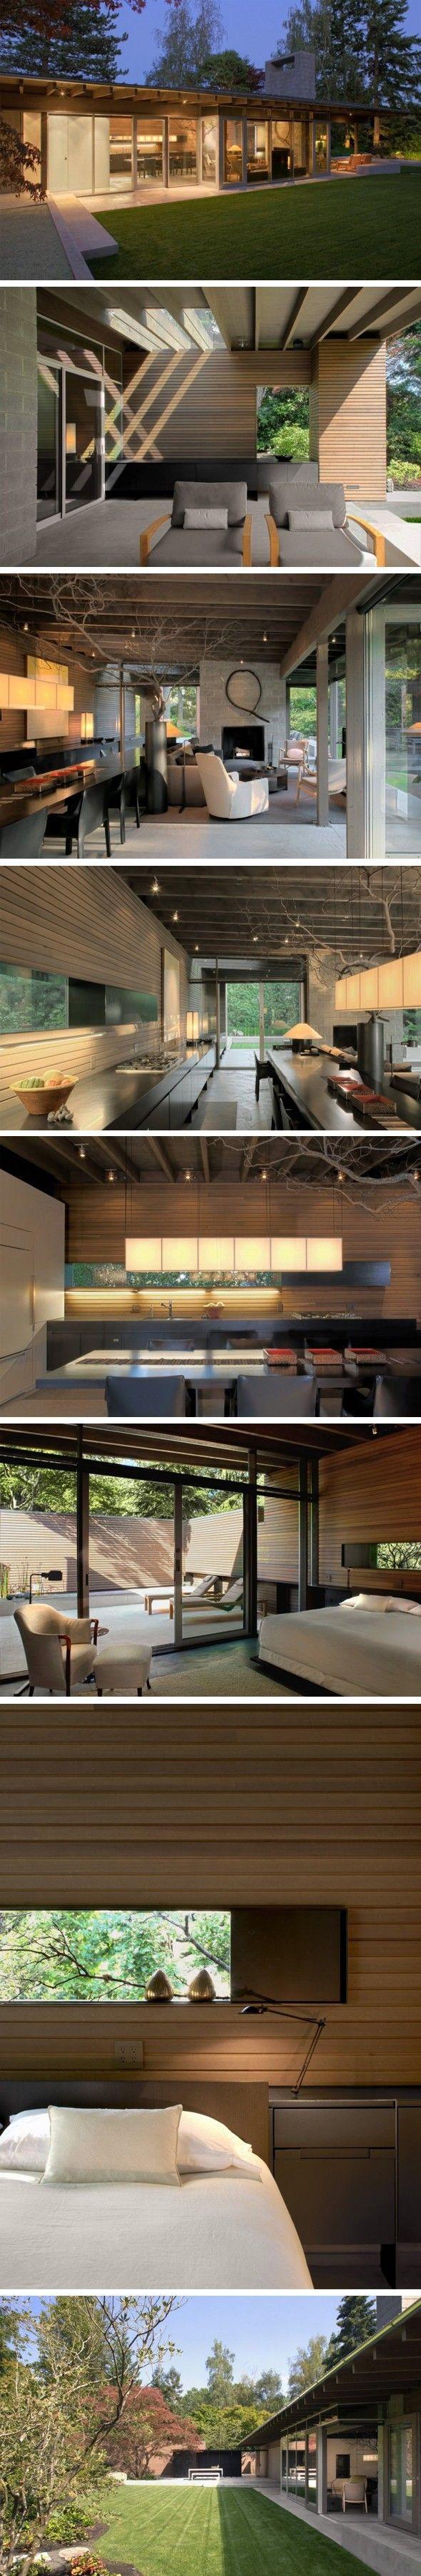 Urban Cabin par Suyama Peterson Deguchi Design Chalets and Cabin